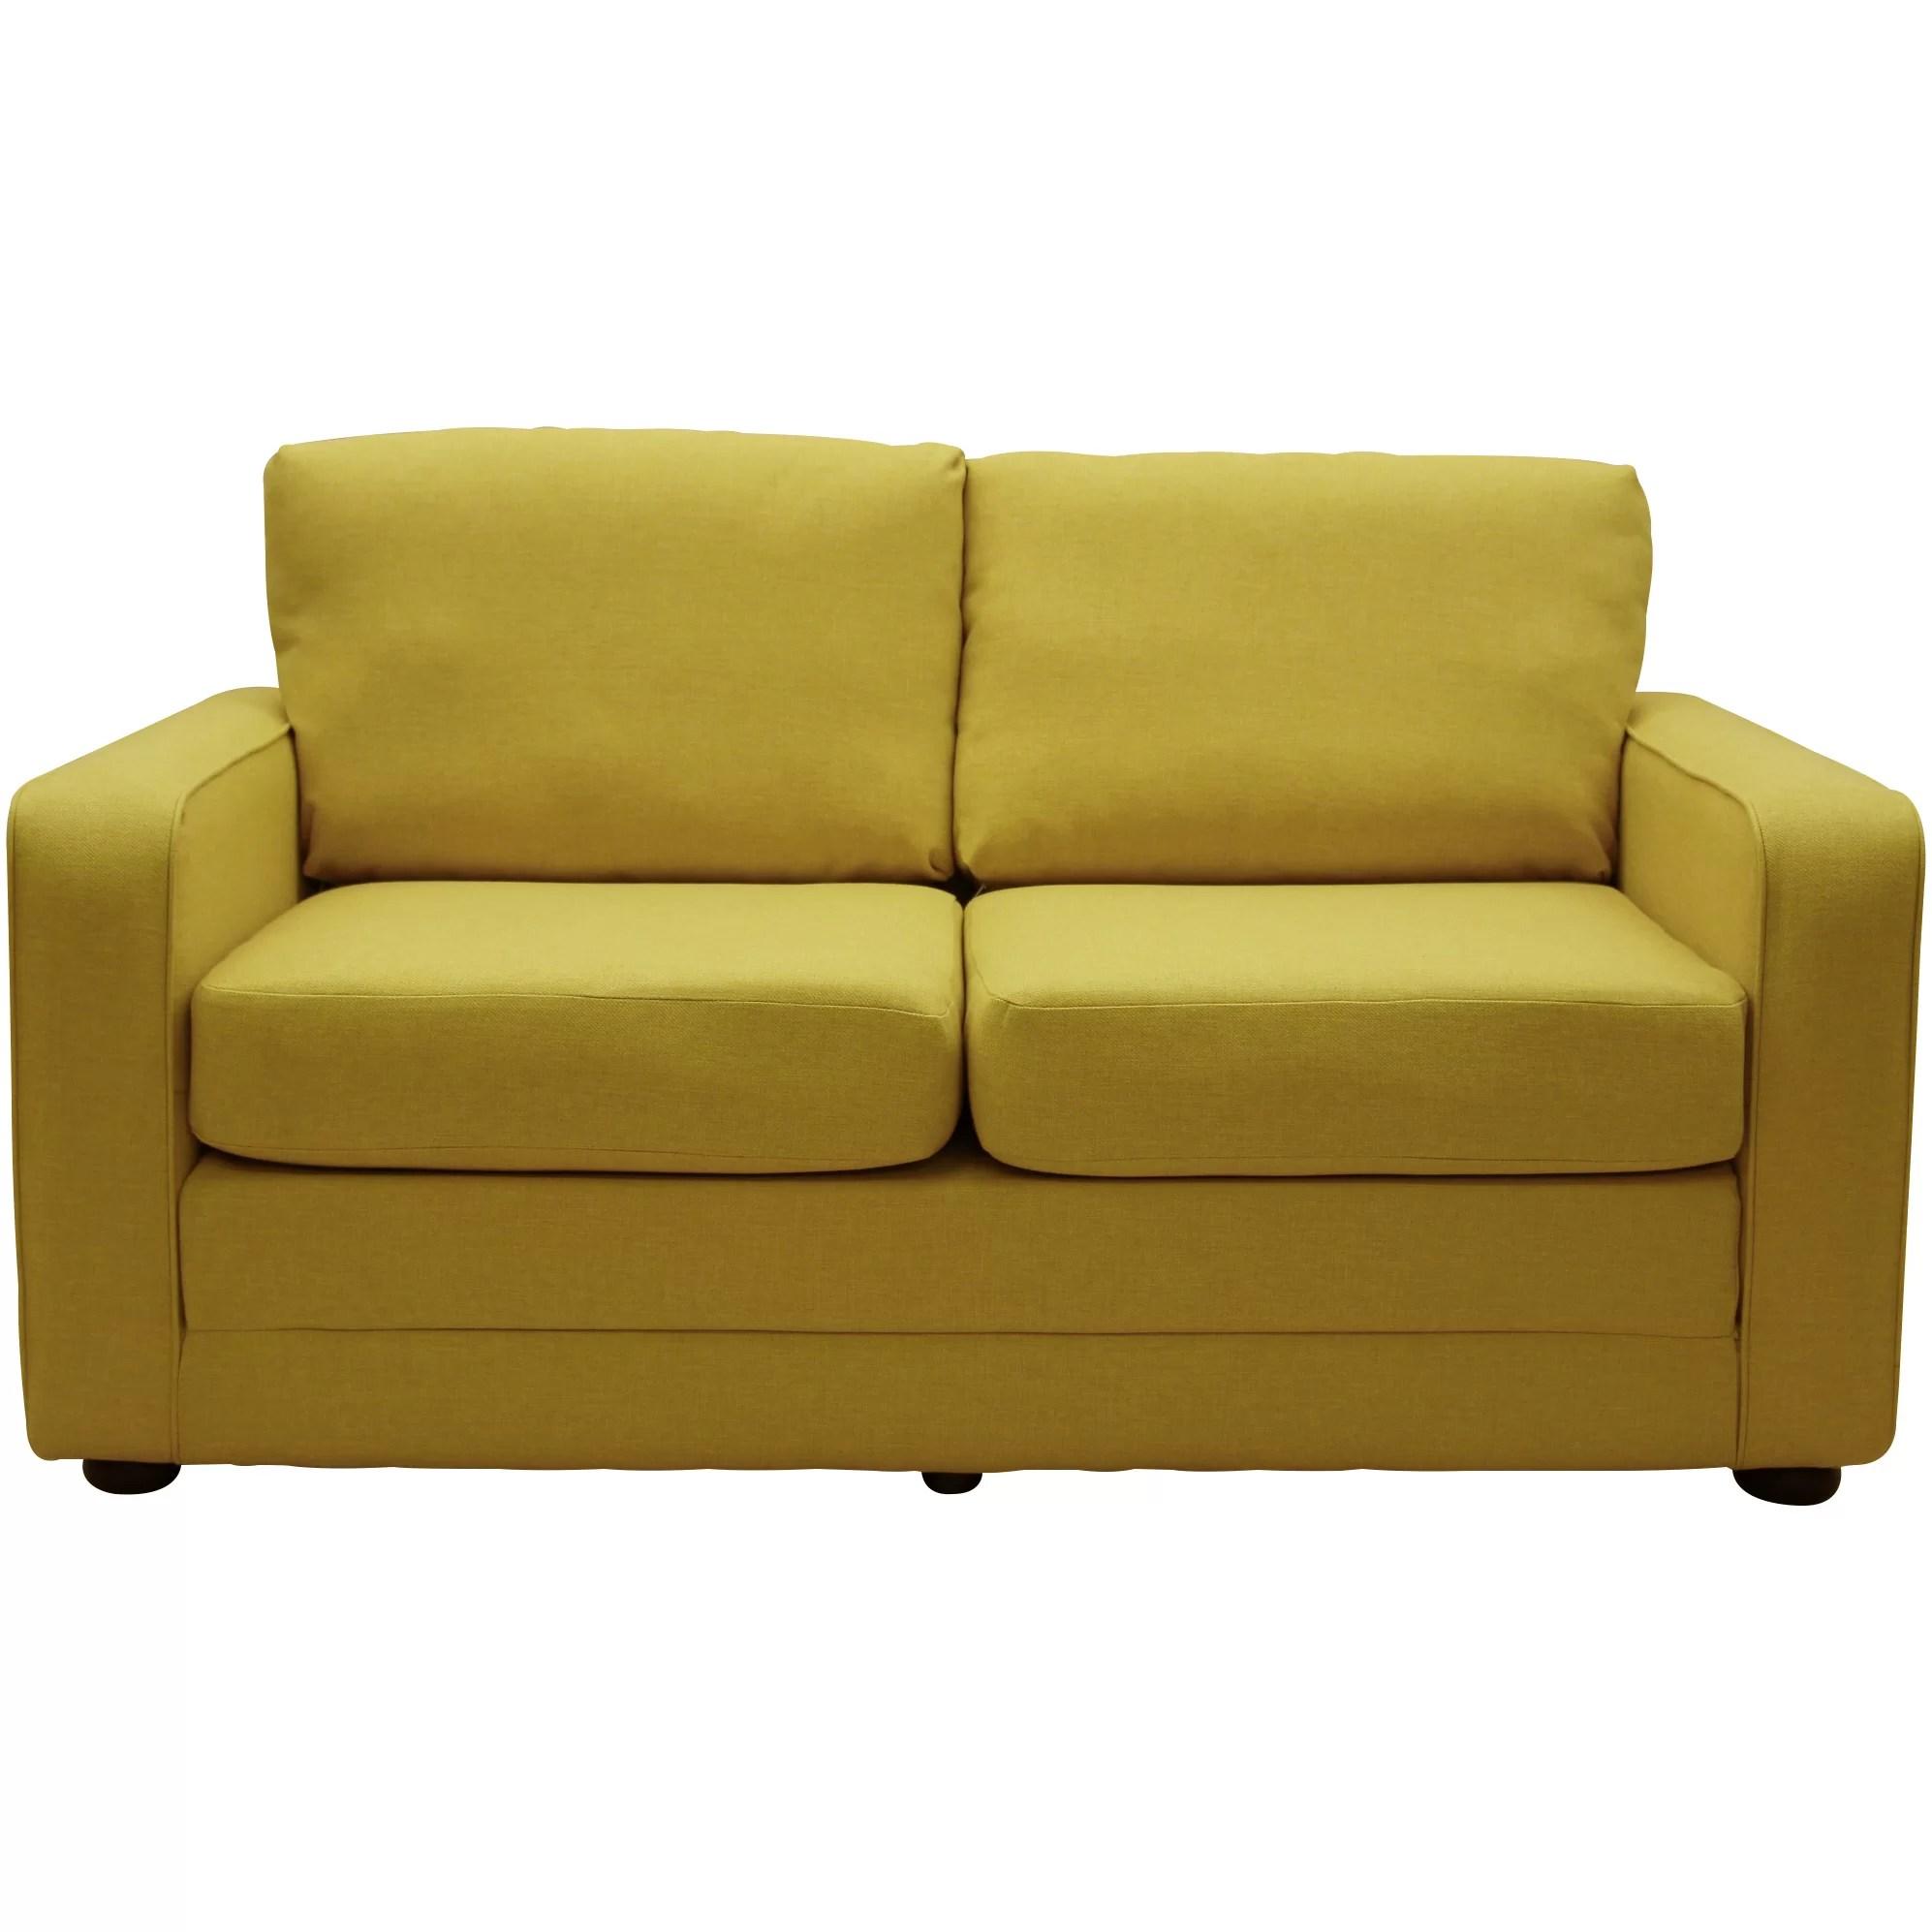 lightweight sofas buy sofa cushions online india latitude run lillian ultra sleeper